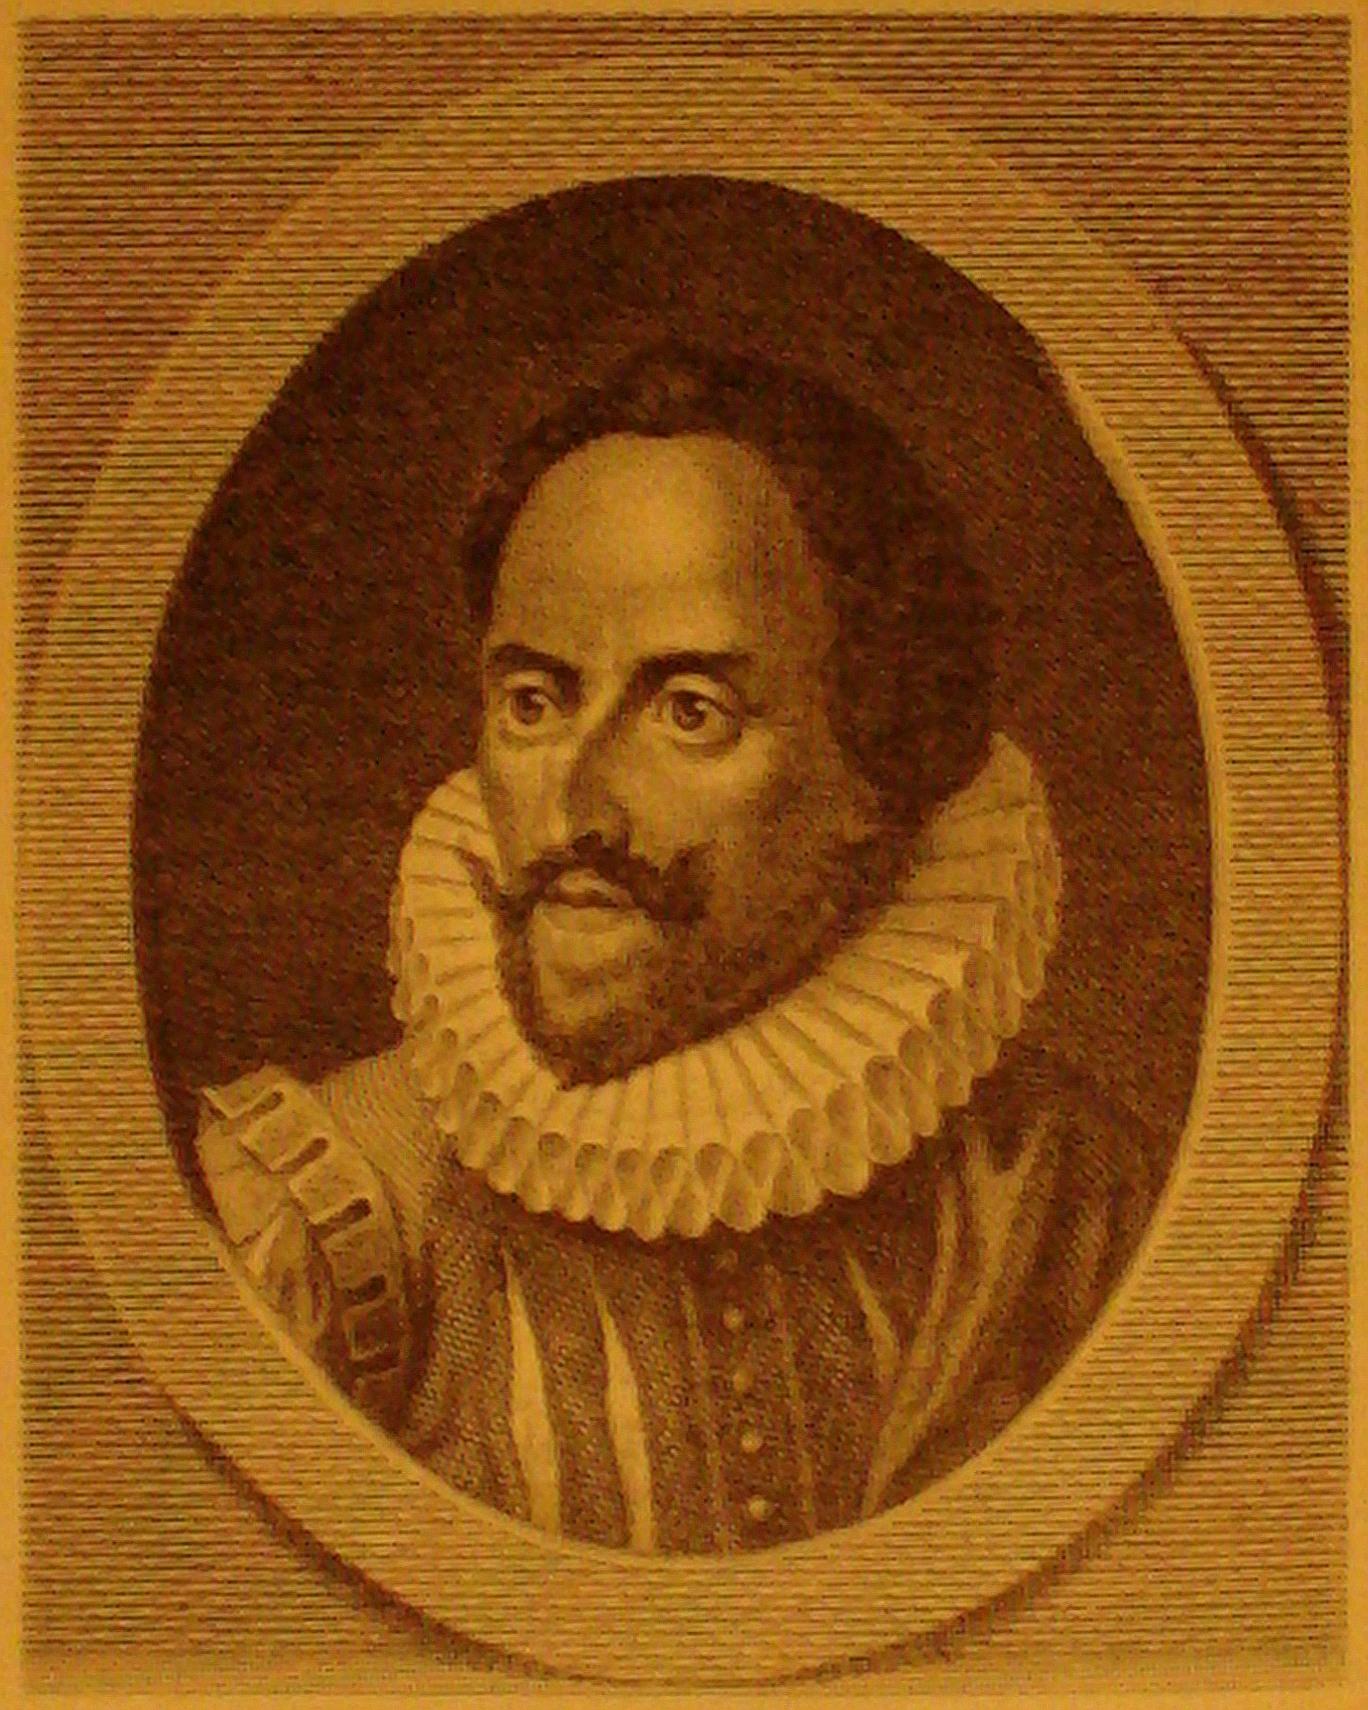 Мигель де Сервантес Сааведра